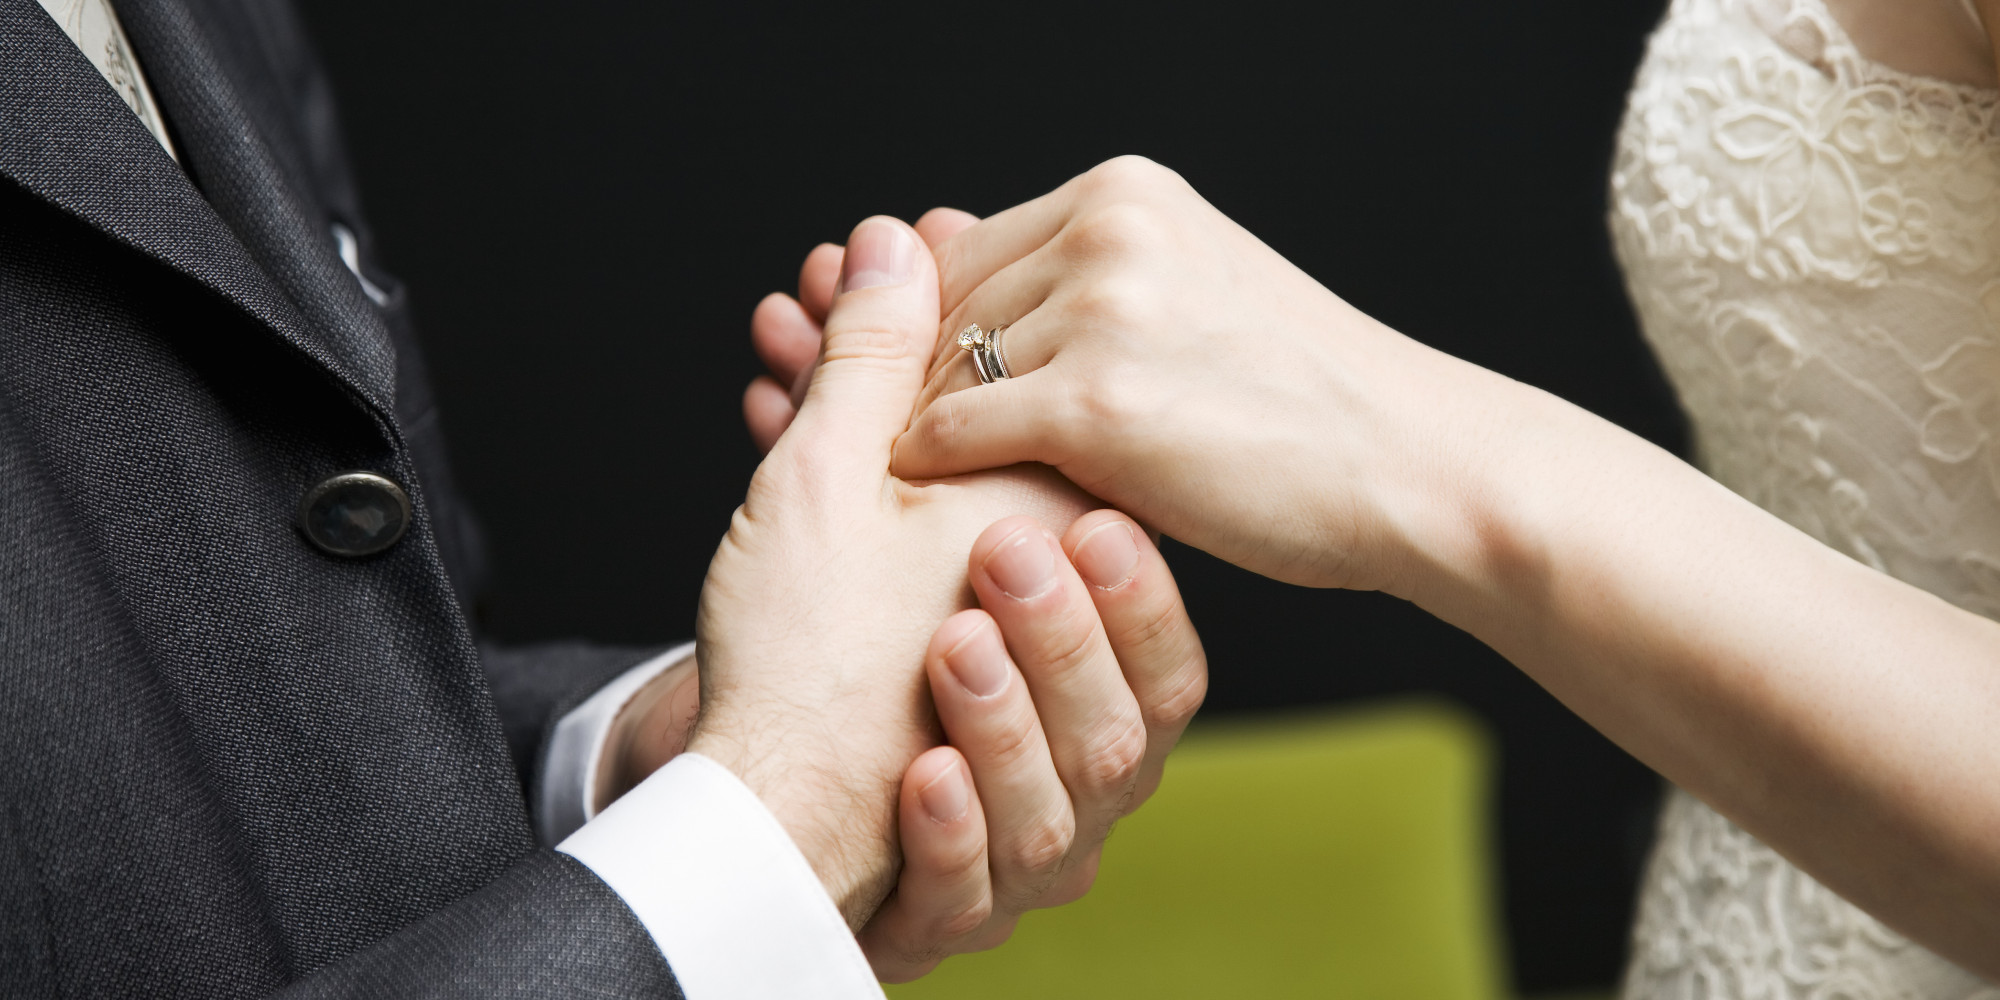 o WEDDING VOWS facebook مسجات ذكرى الزواج 2017   اجمل رسائل ذكرى زواج